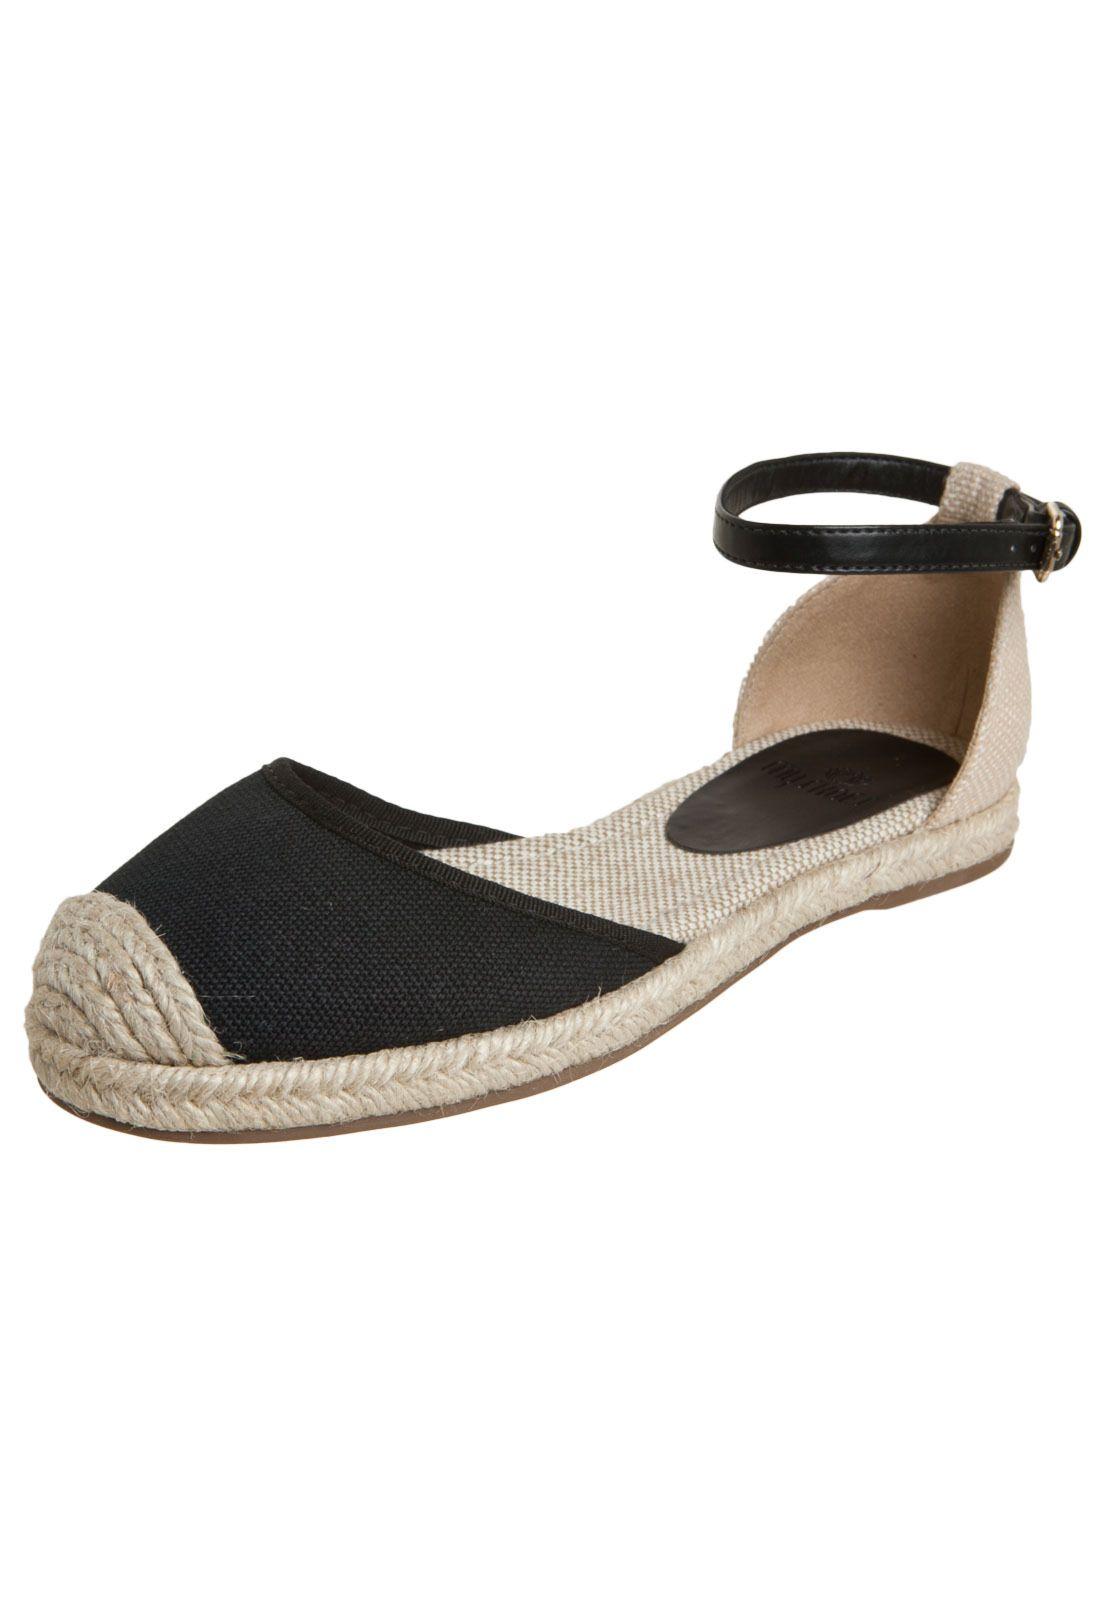 7c8a35508a Sapatilha My Shoes Alpargata Crochet Preto - Compre Agora